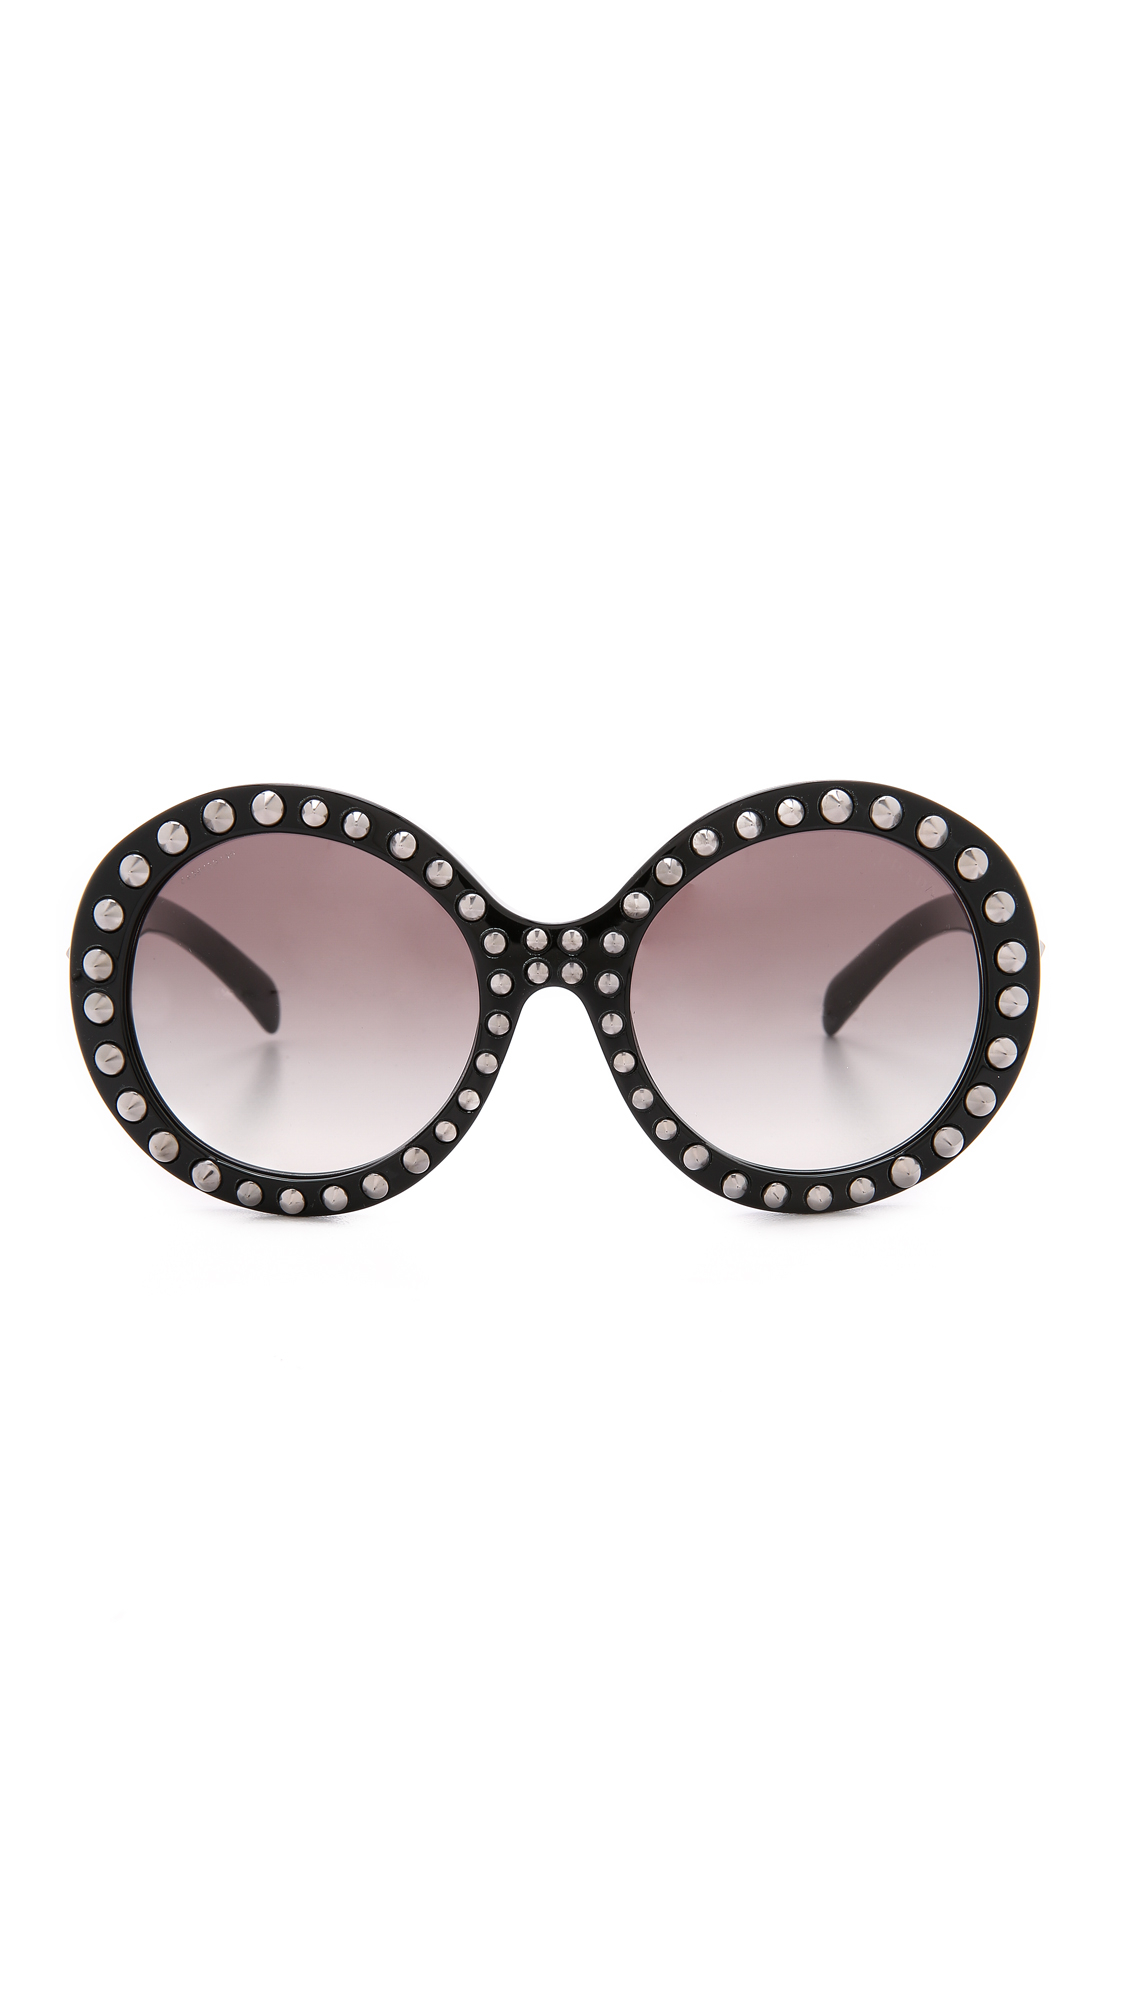 Studded Sunglasses  prada studded sunglasses black grey grant in black lyst